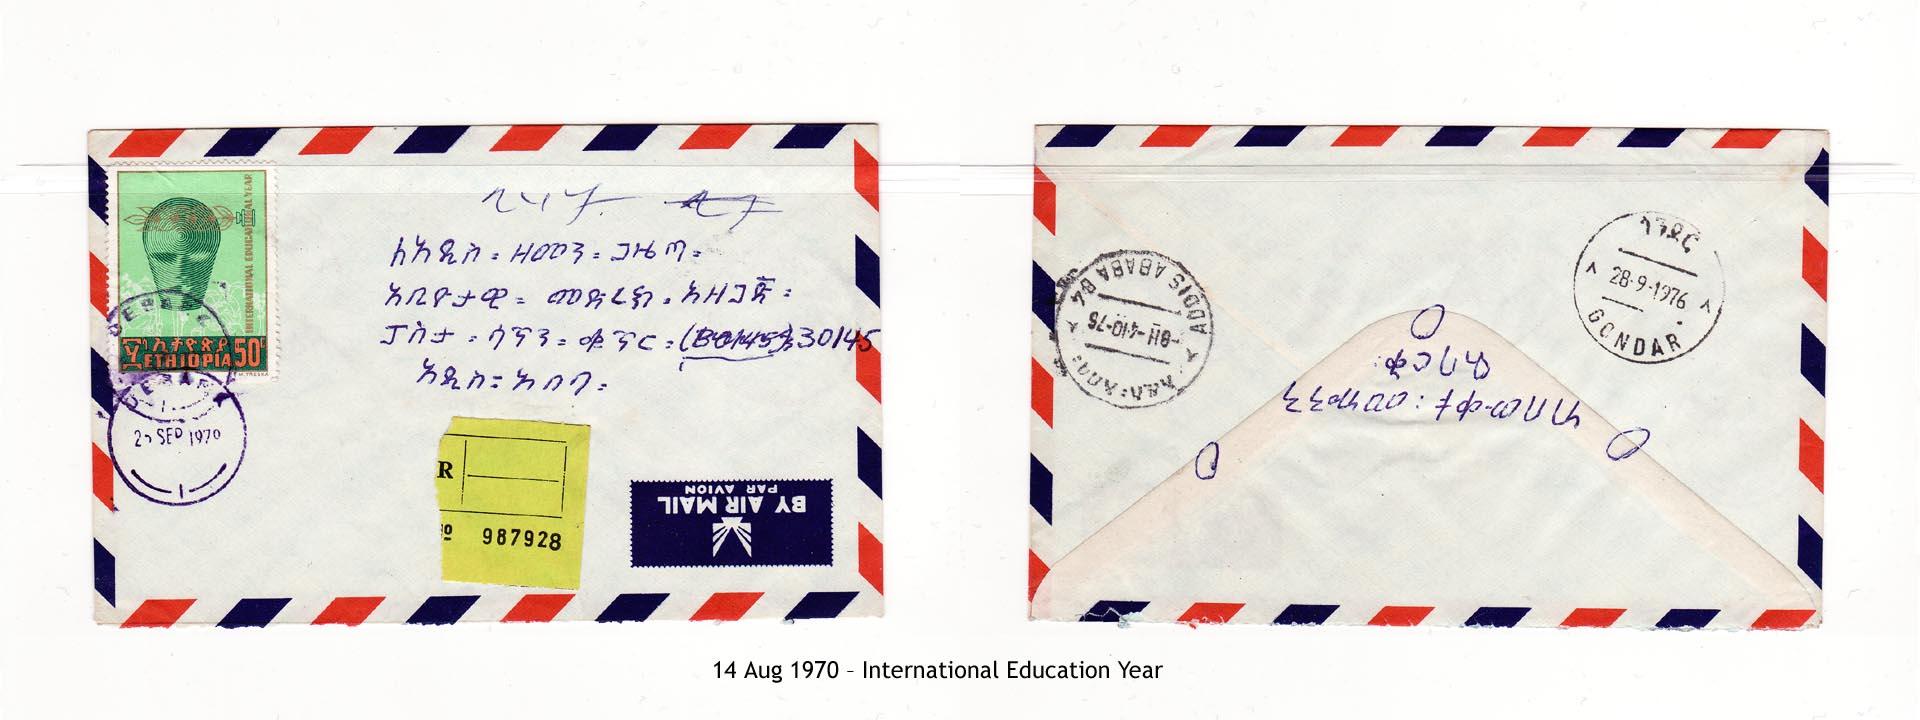 19700814 – International Education Year